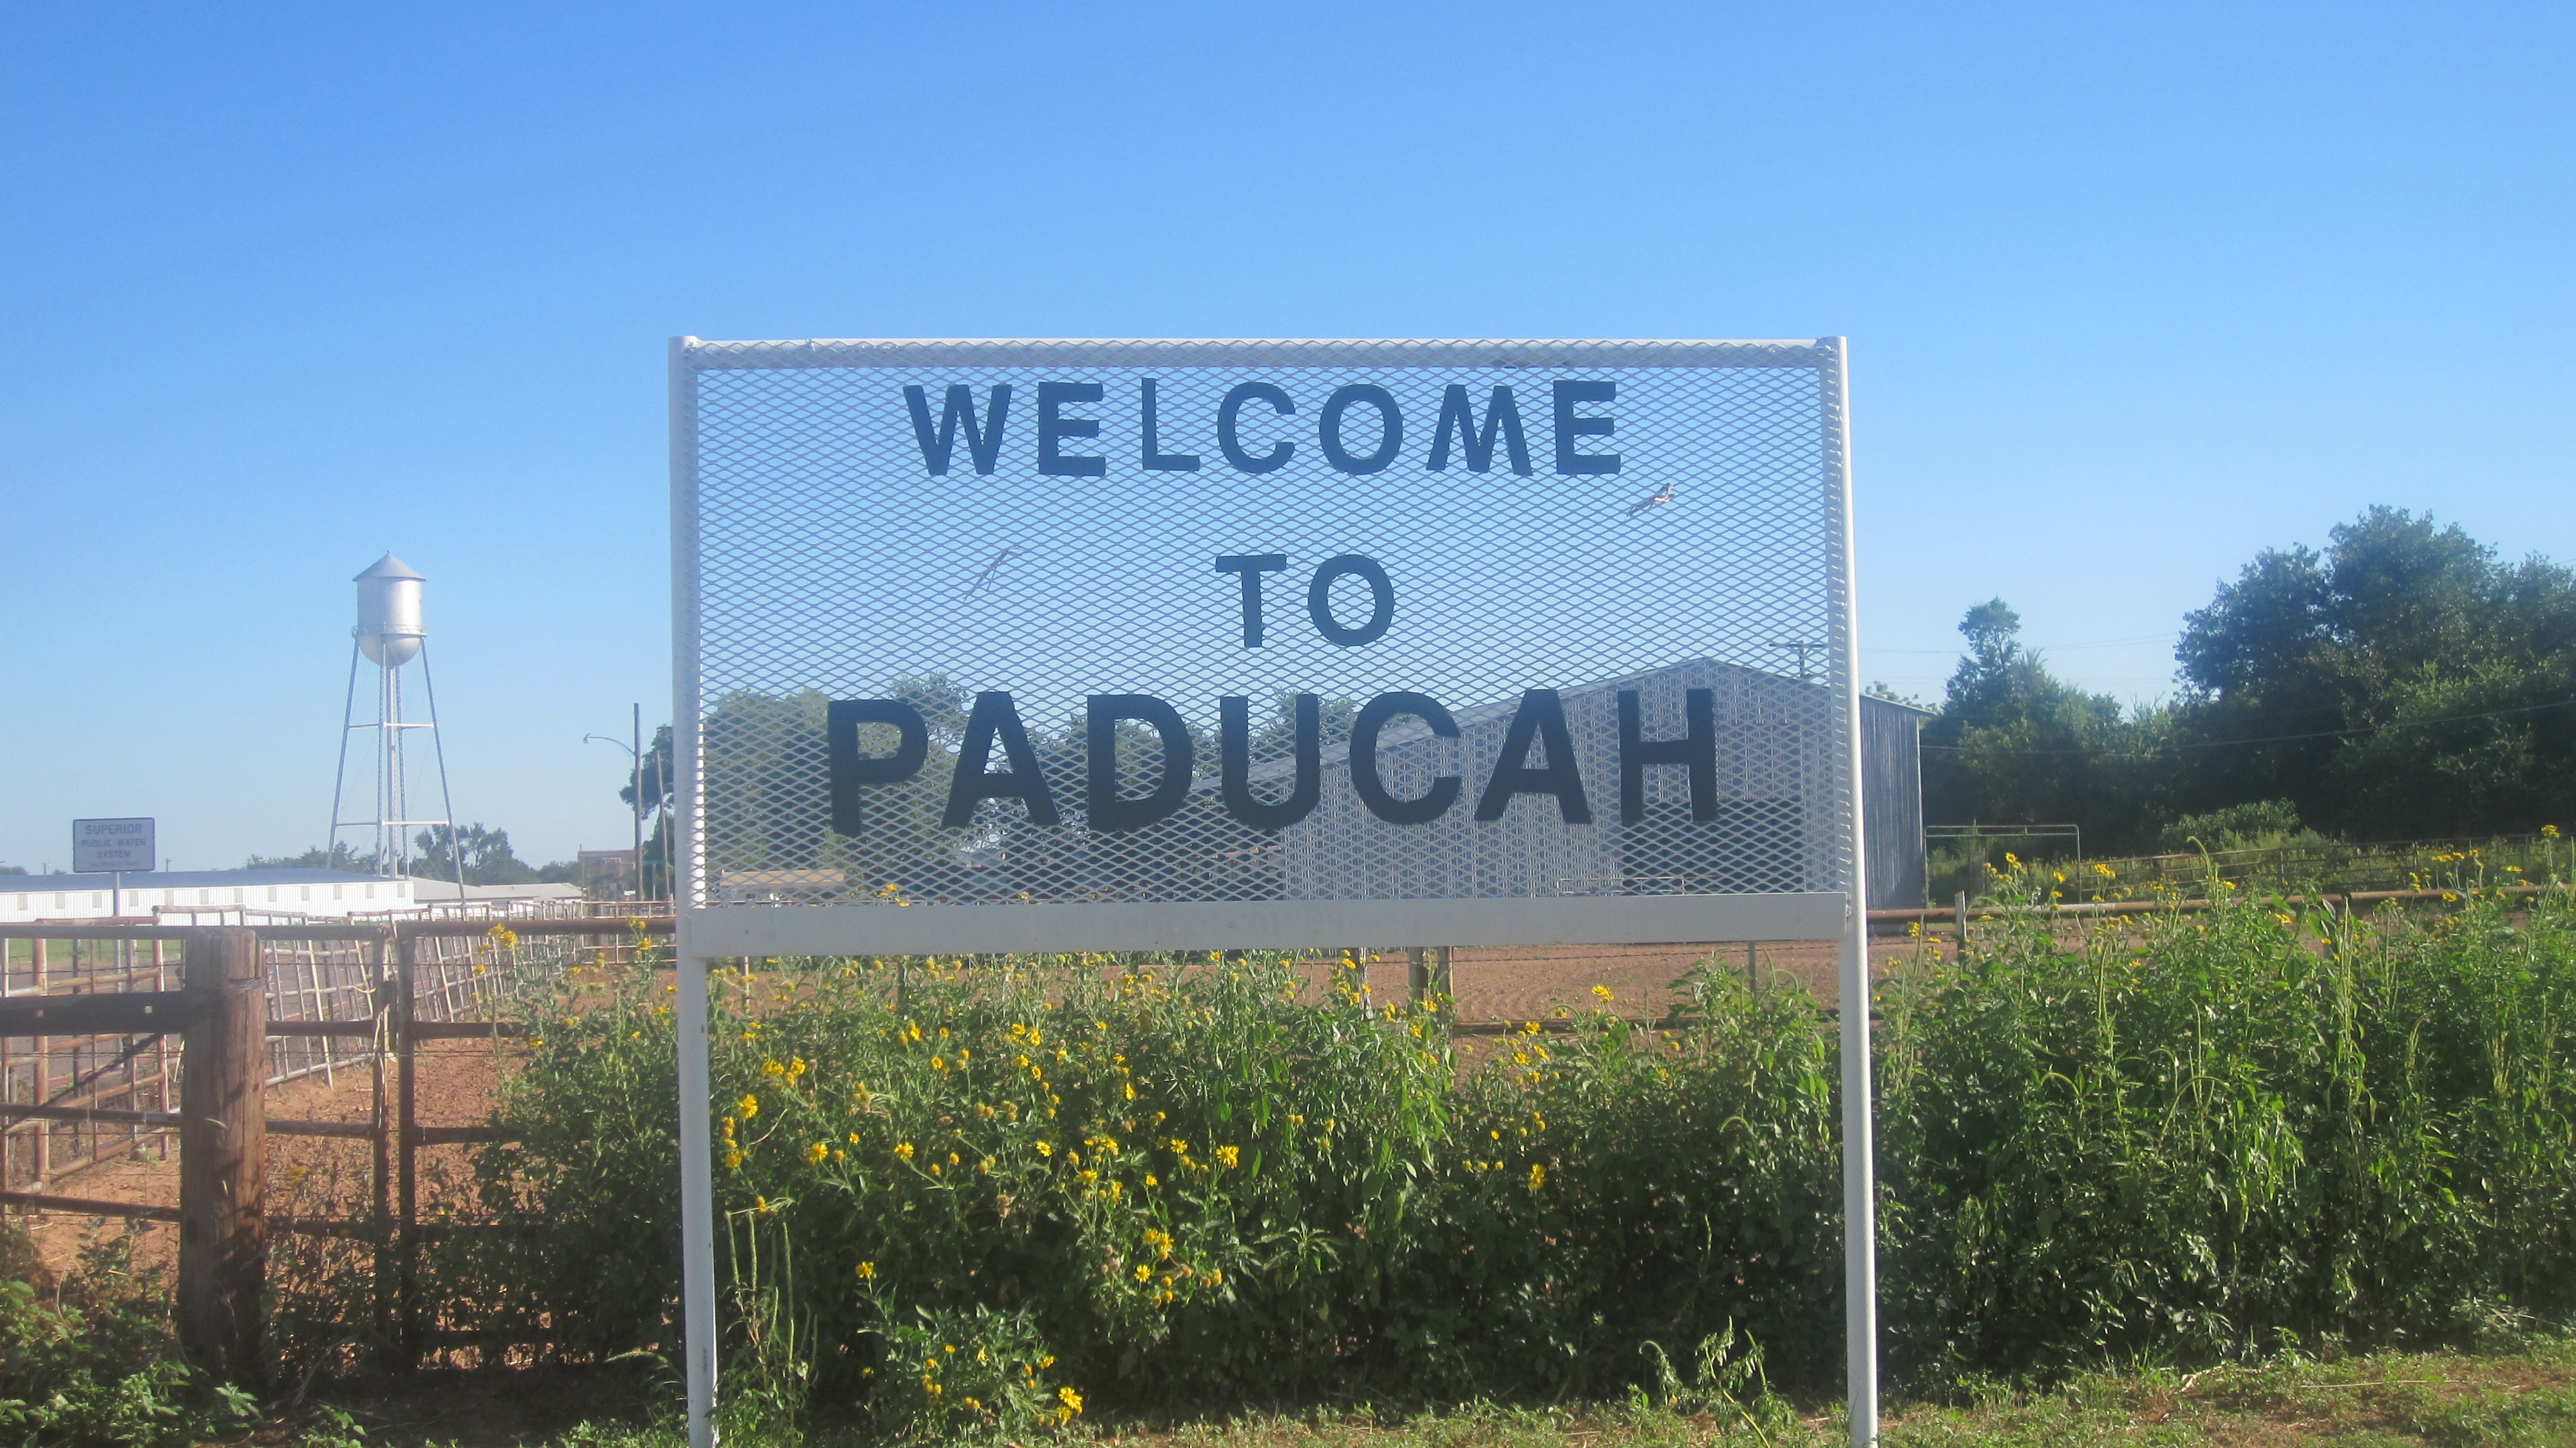 Paducah (Texas)